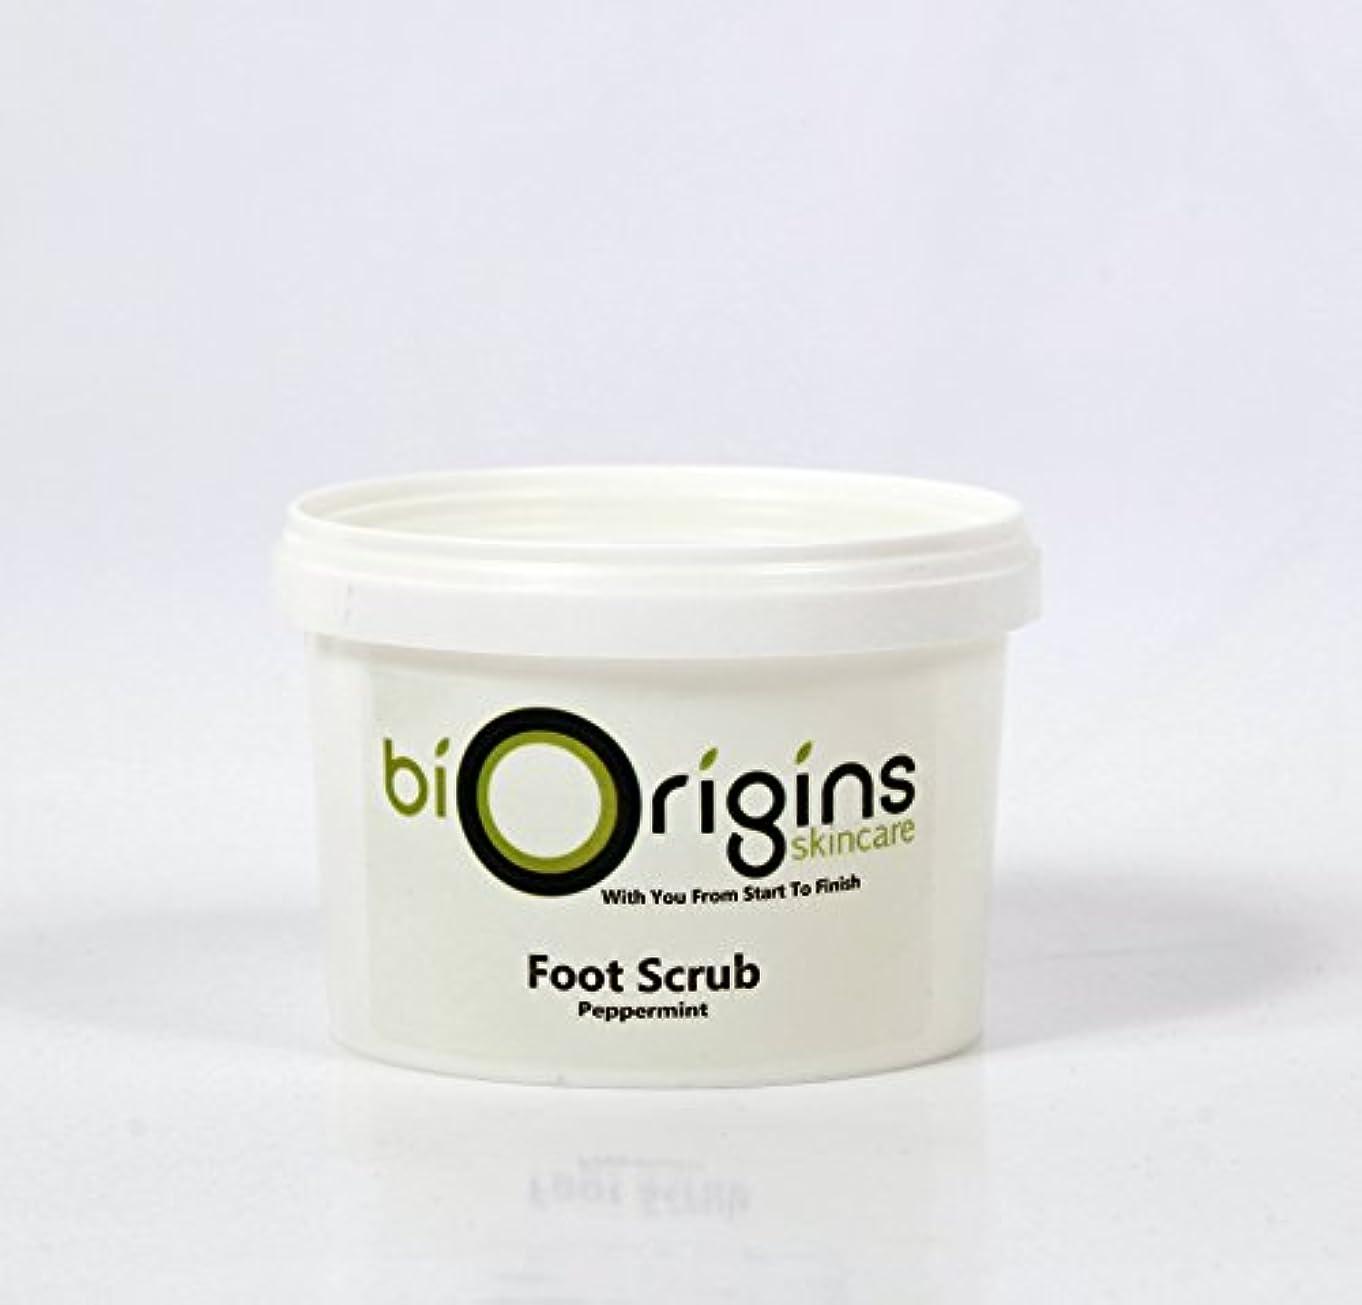 Foot Scrub Peppermint - Botanical Skincare Base - 500g